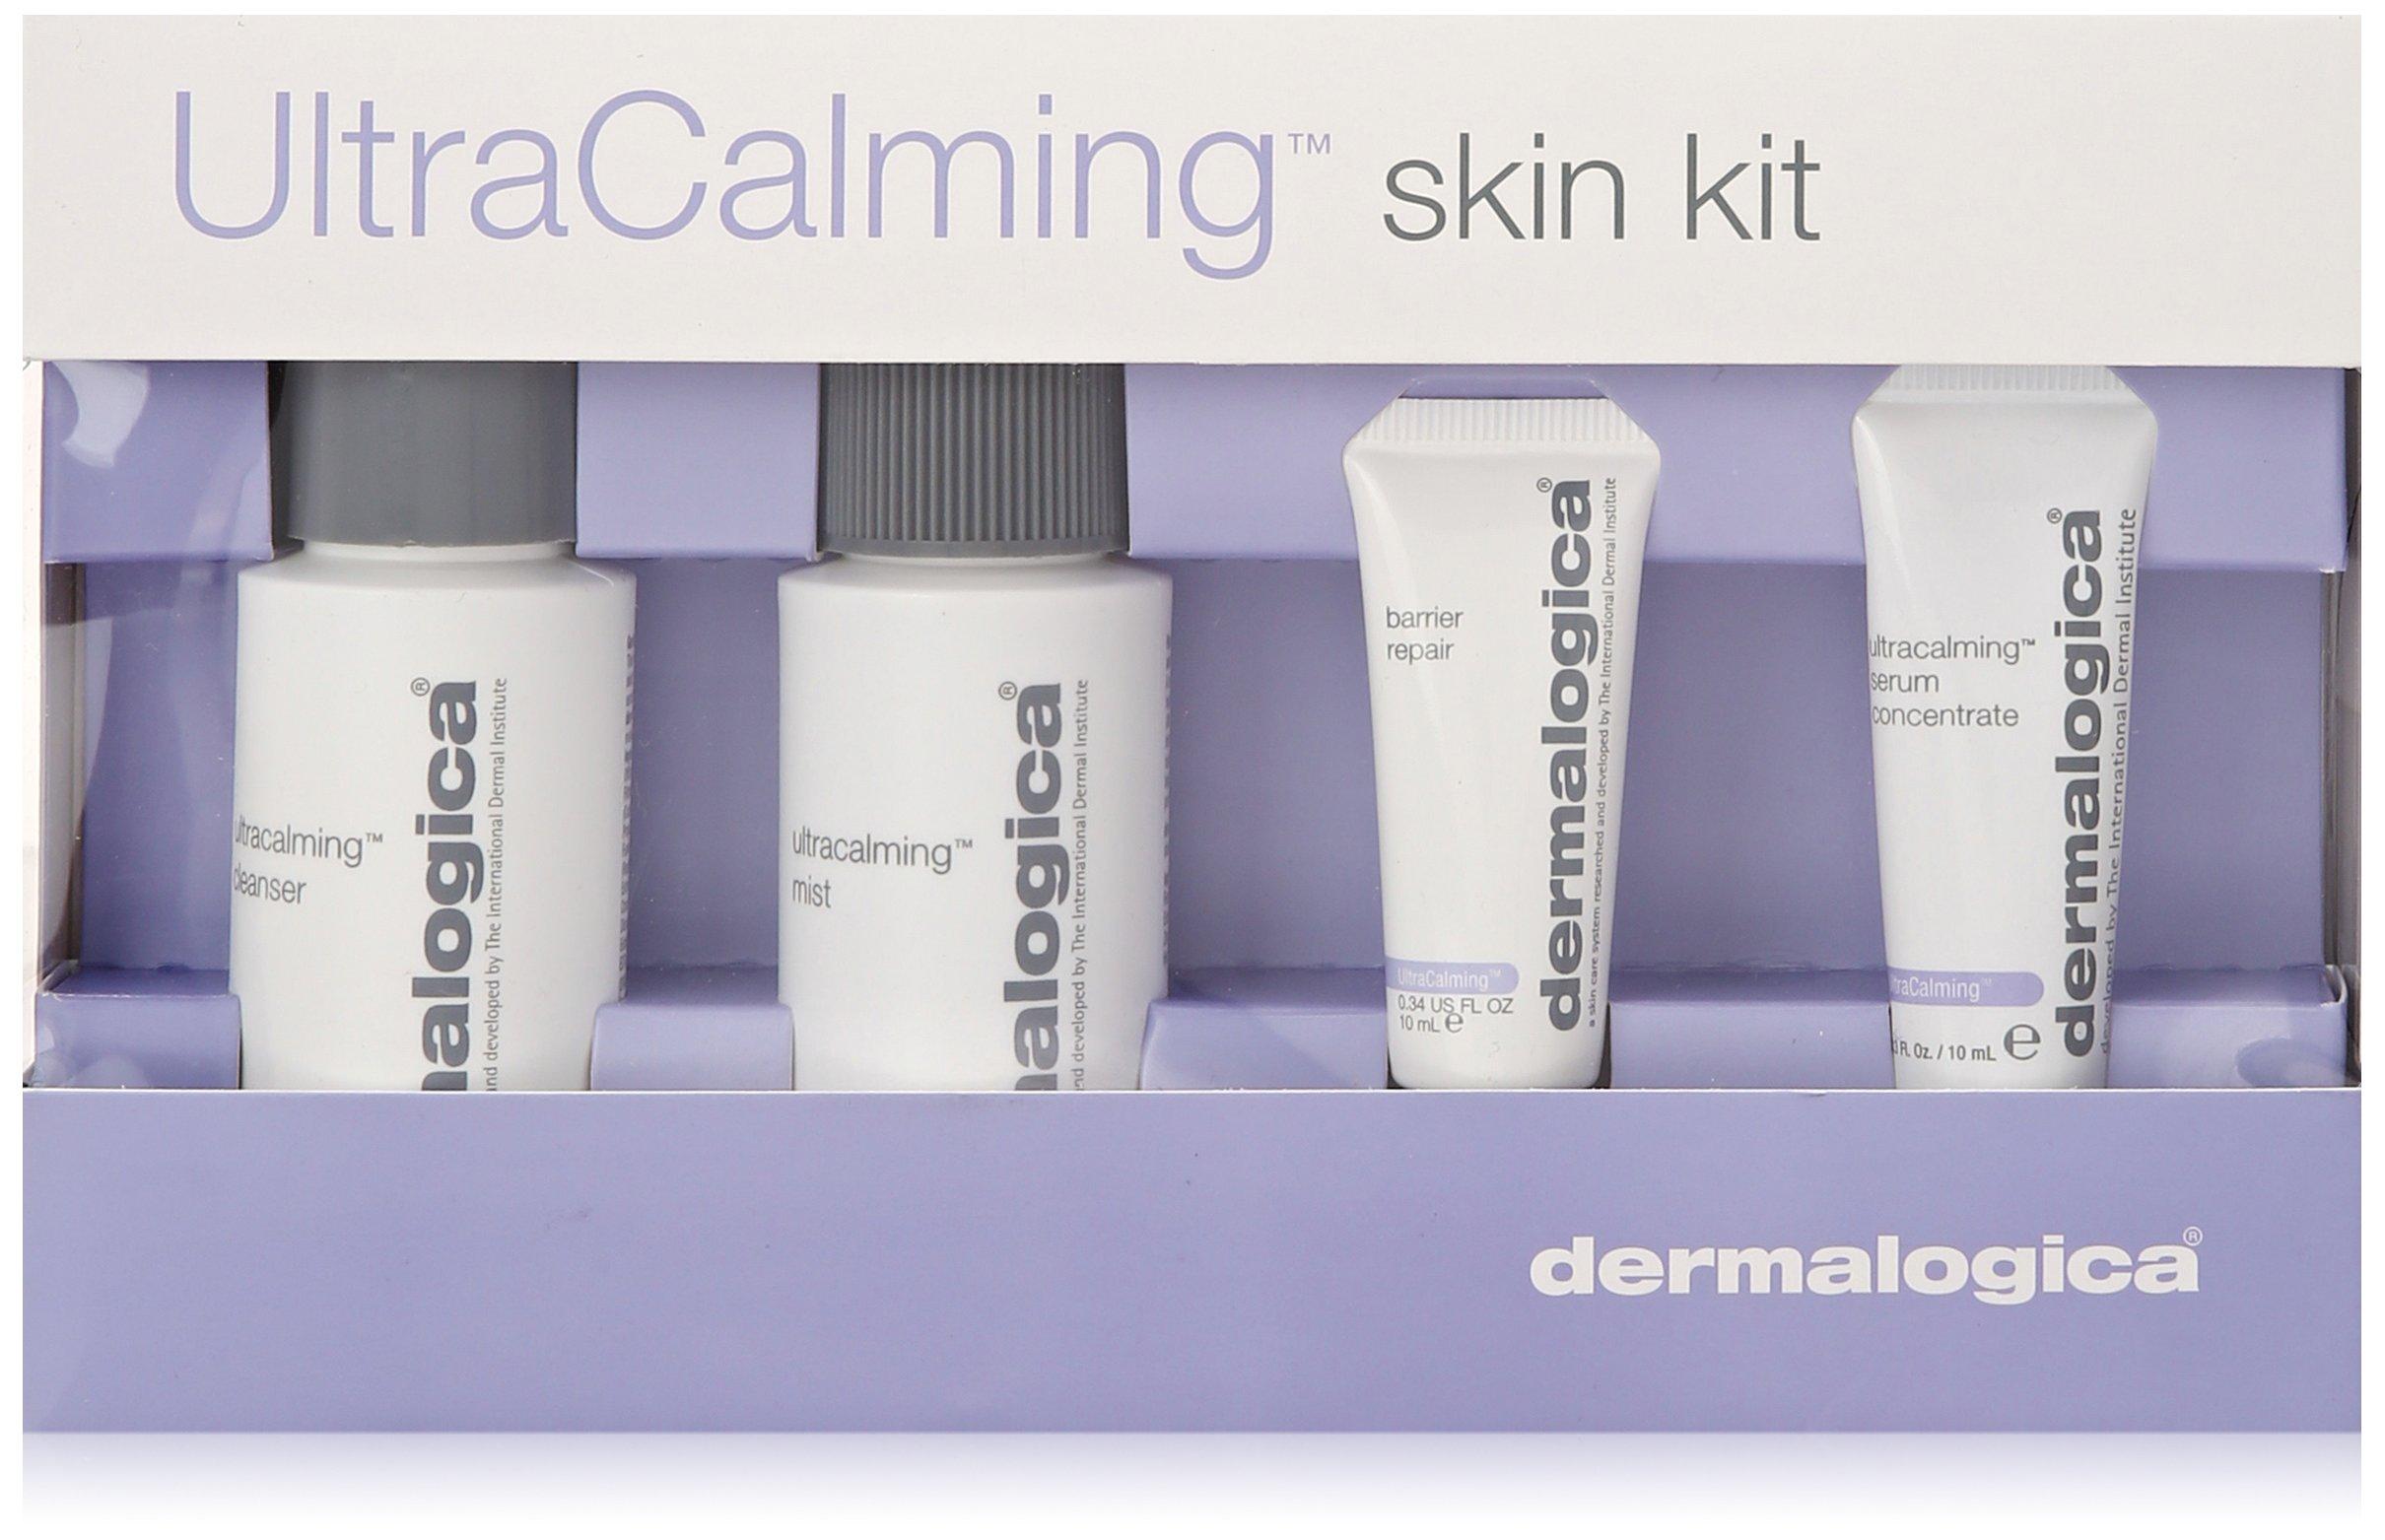 Dermalogica Ultracalming Skin Treatment Kit